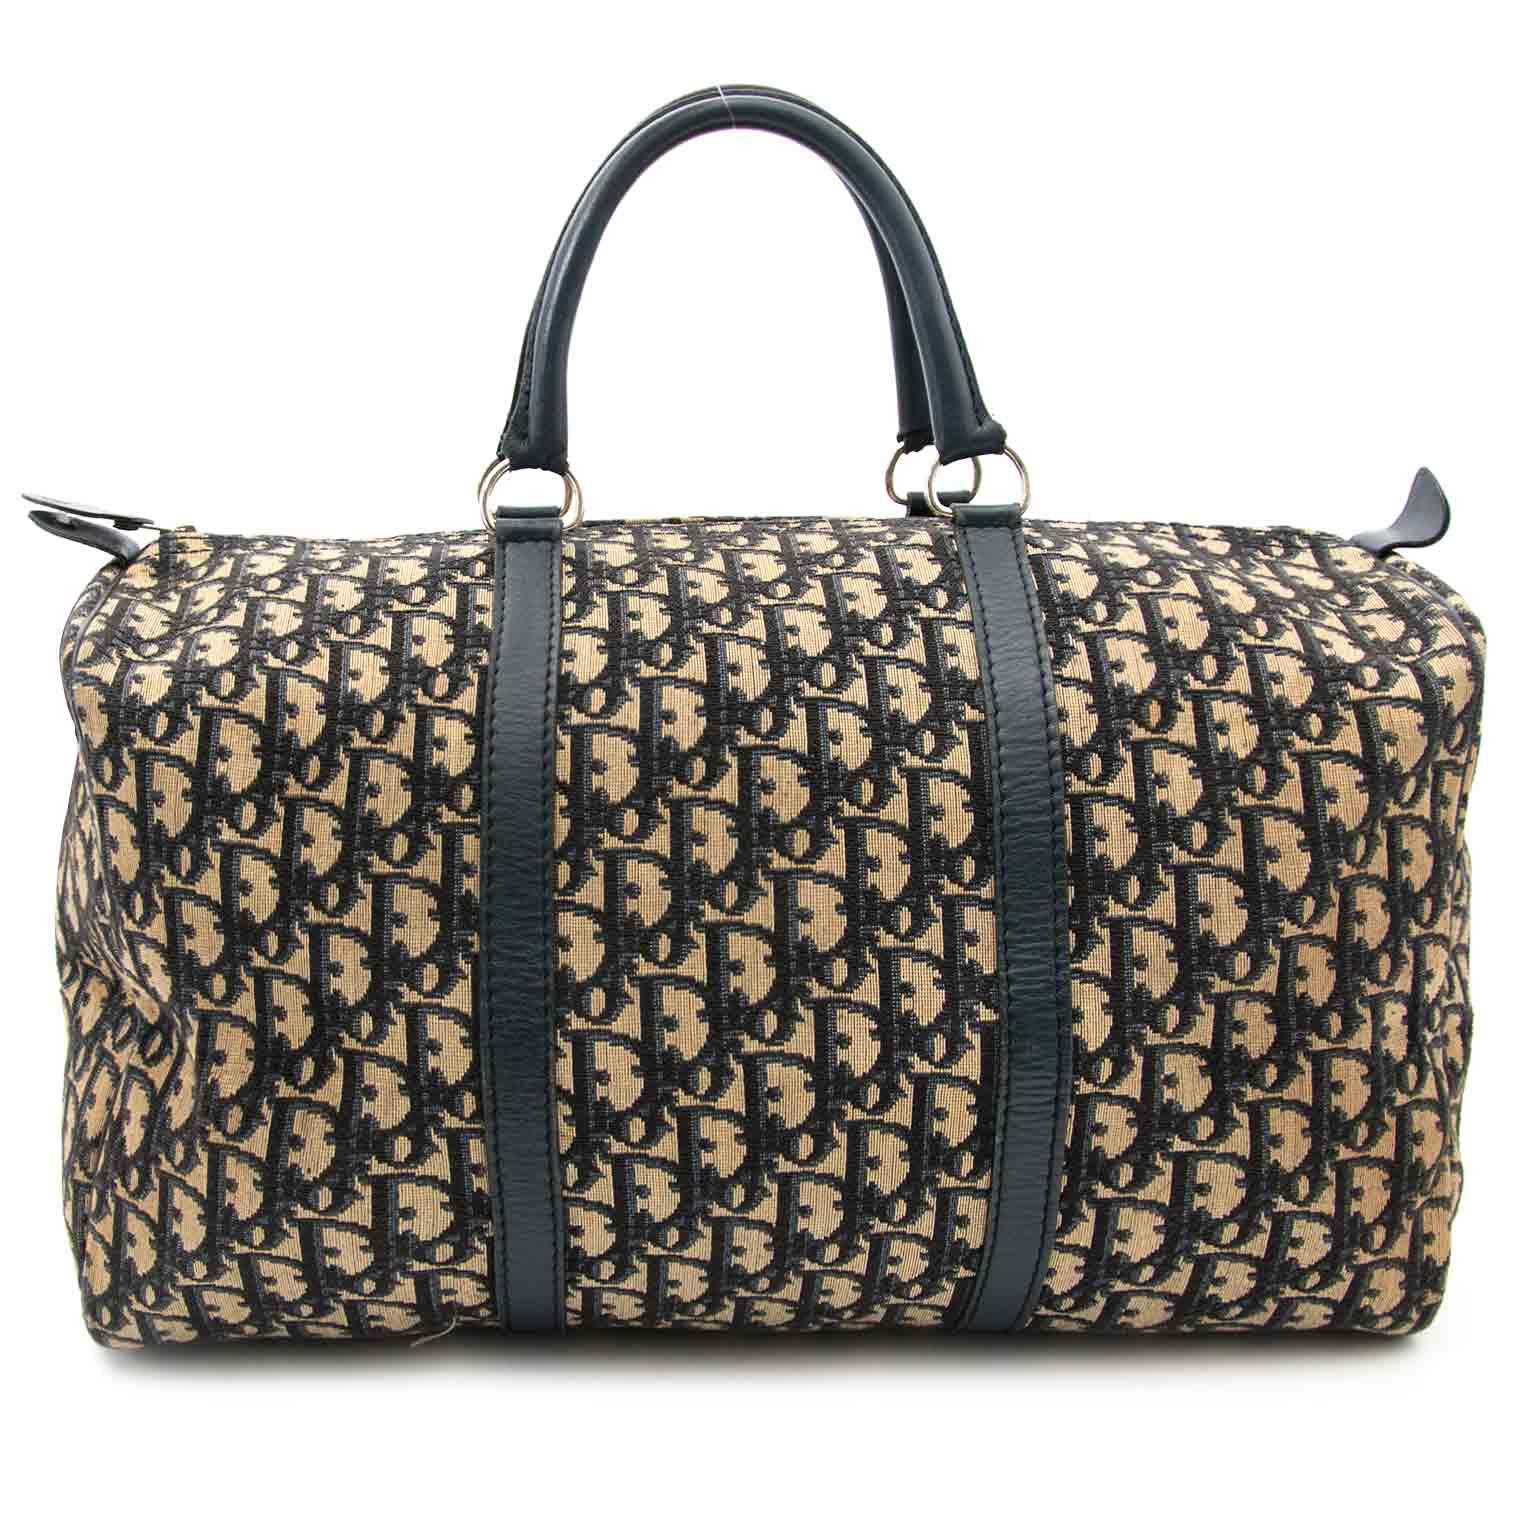 Dior Blue Monogram Boston Bag aan de beste prijs bij Labellov